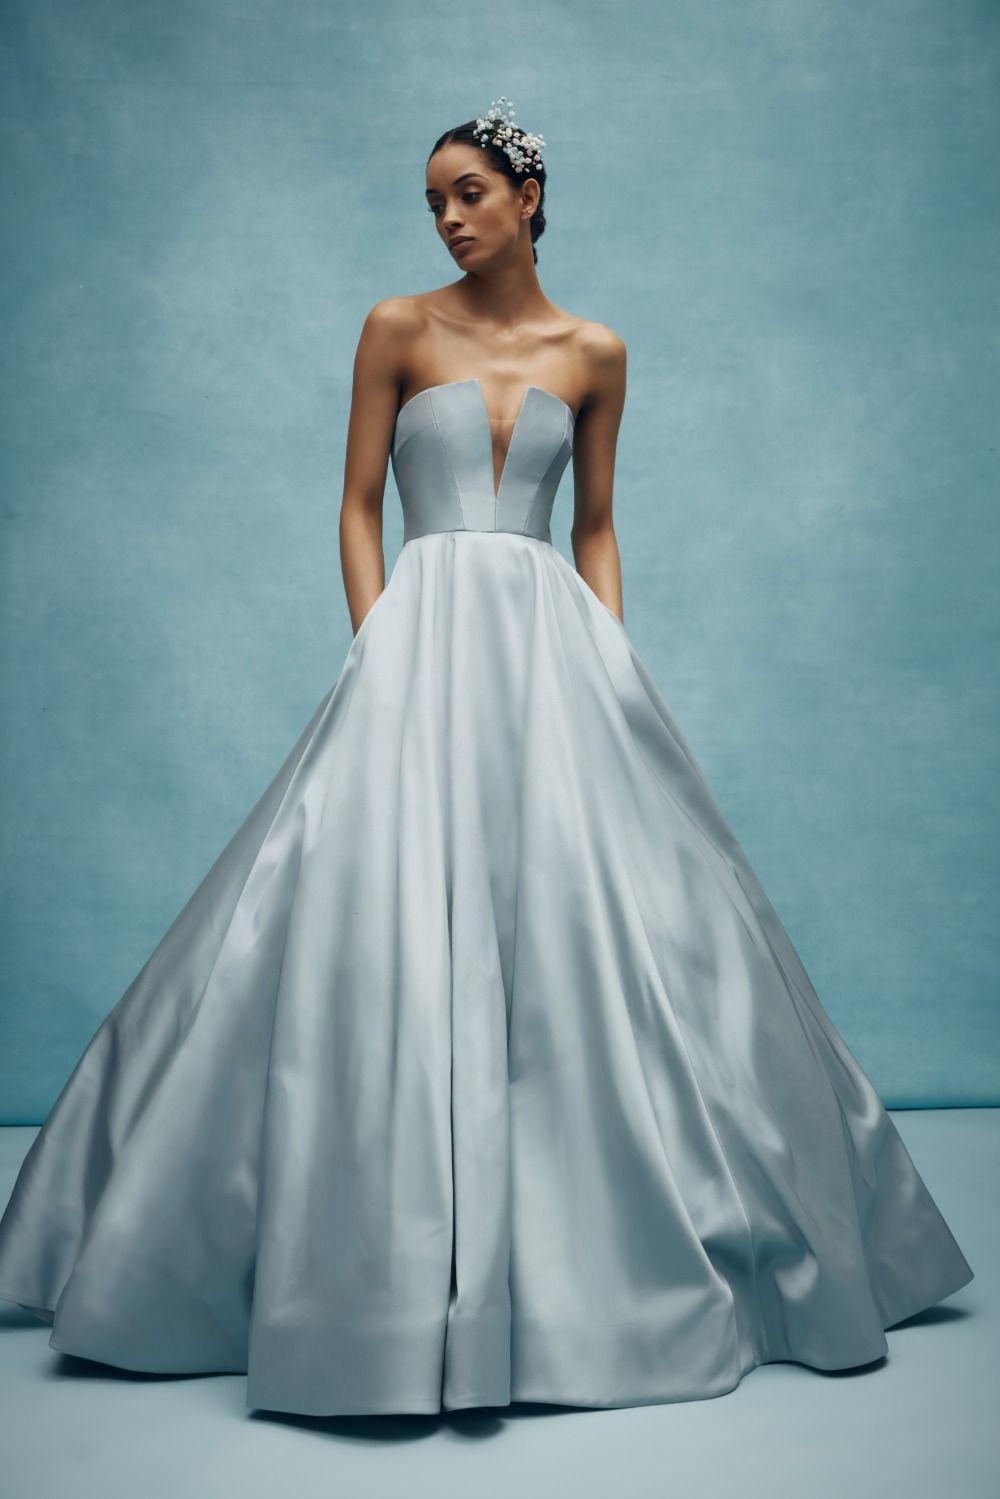 c76feeb11abf Anne Barge Spring 2020 Bridal Collection #wedding #love  #weddingphotography#bridesmaiddress #weddinginvitations